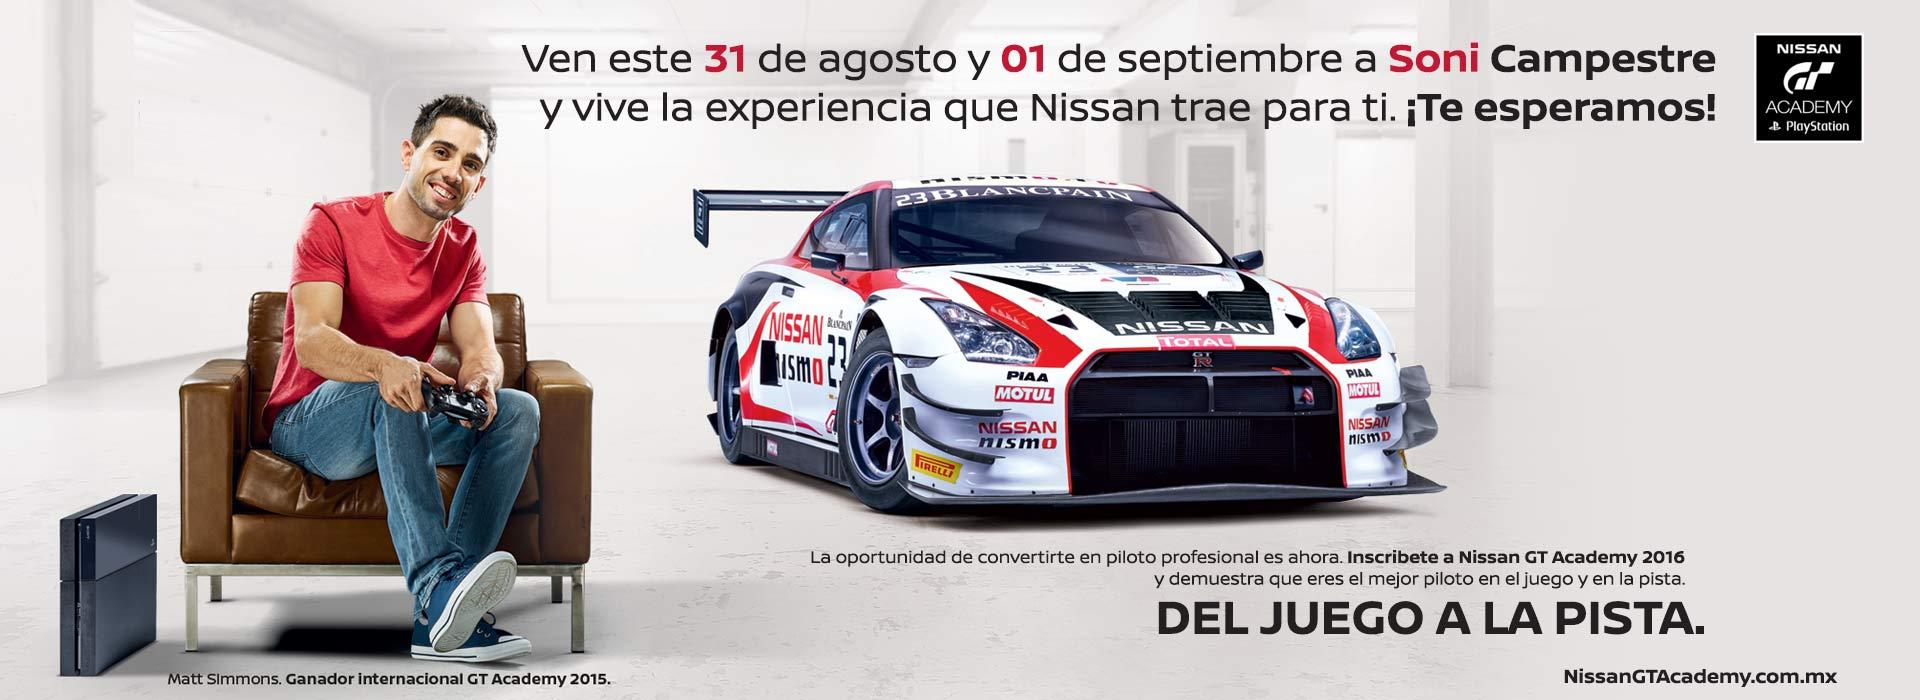 Nissan GT Academy- Soni Campestre